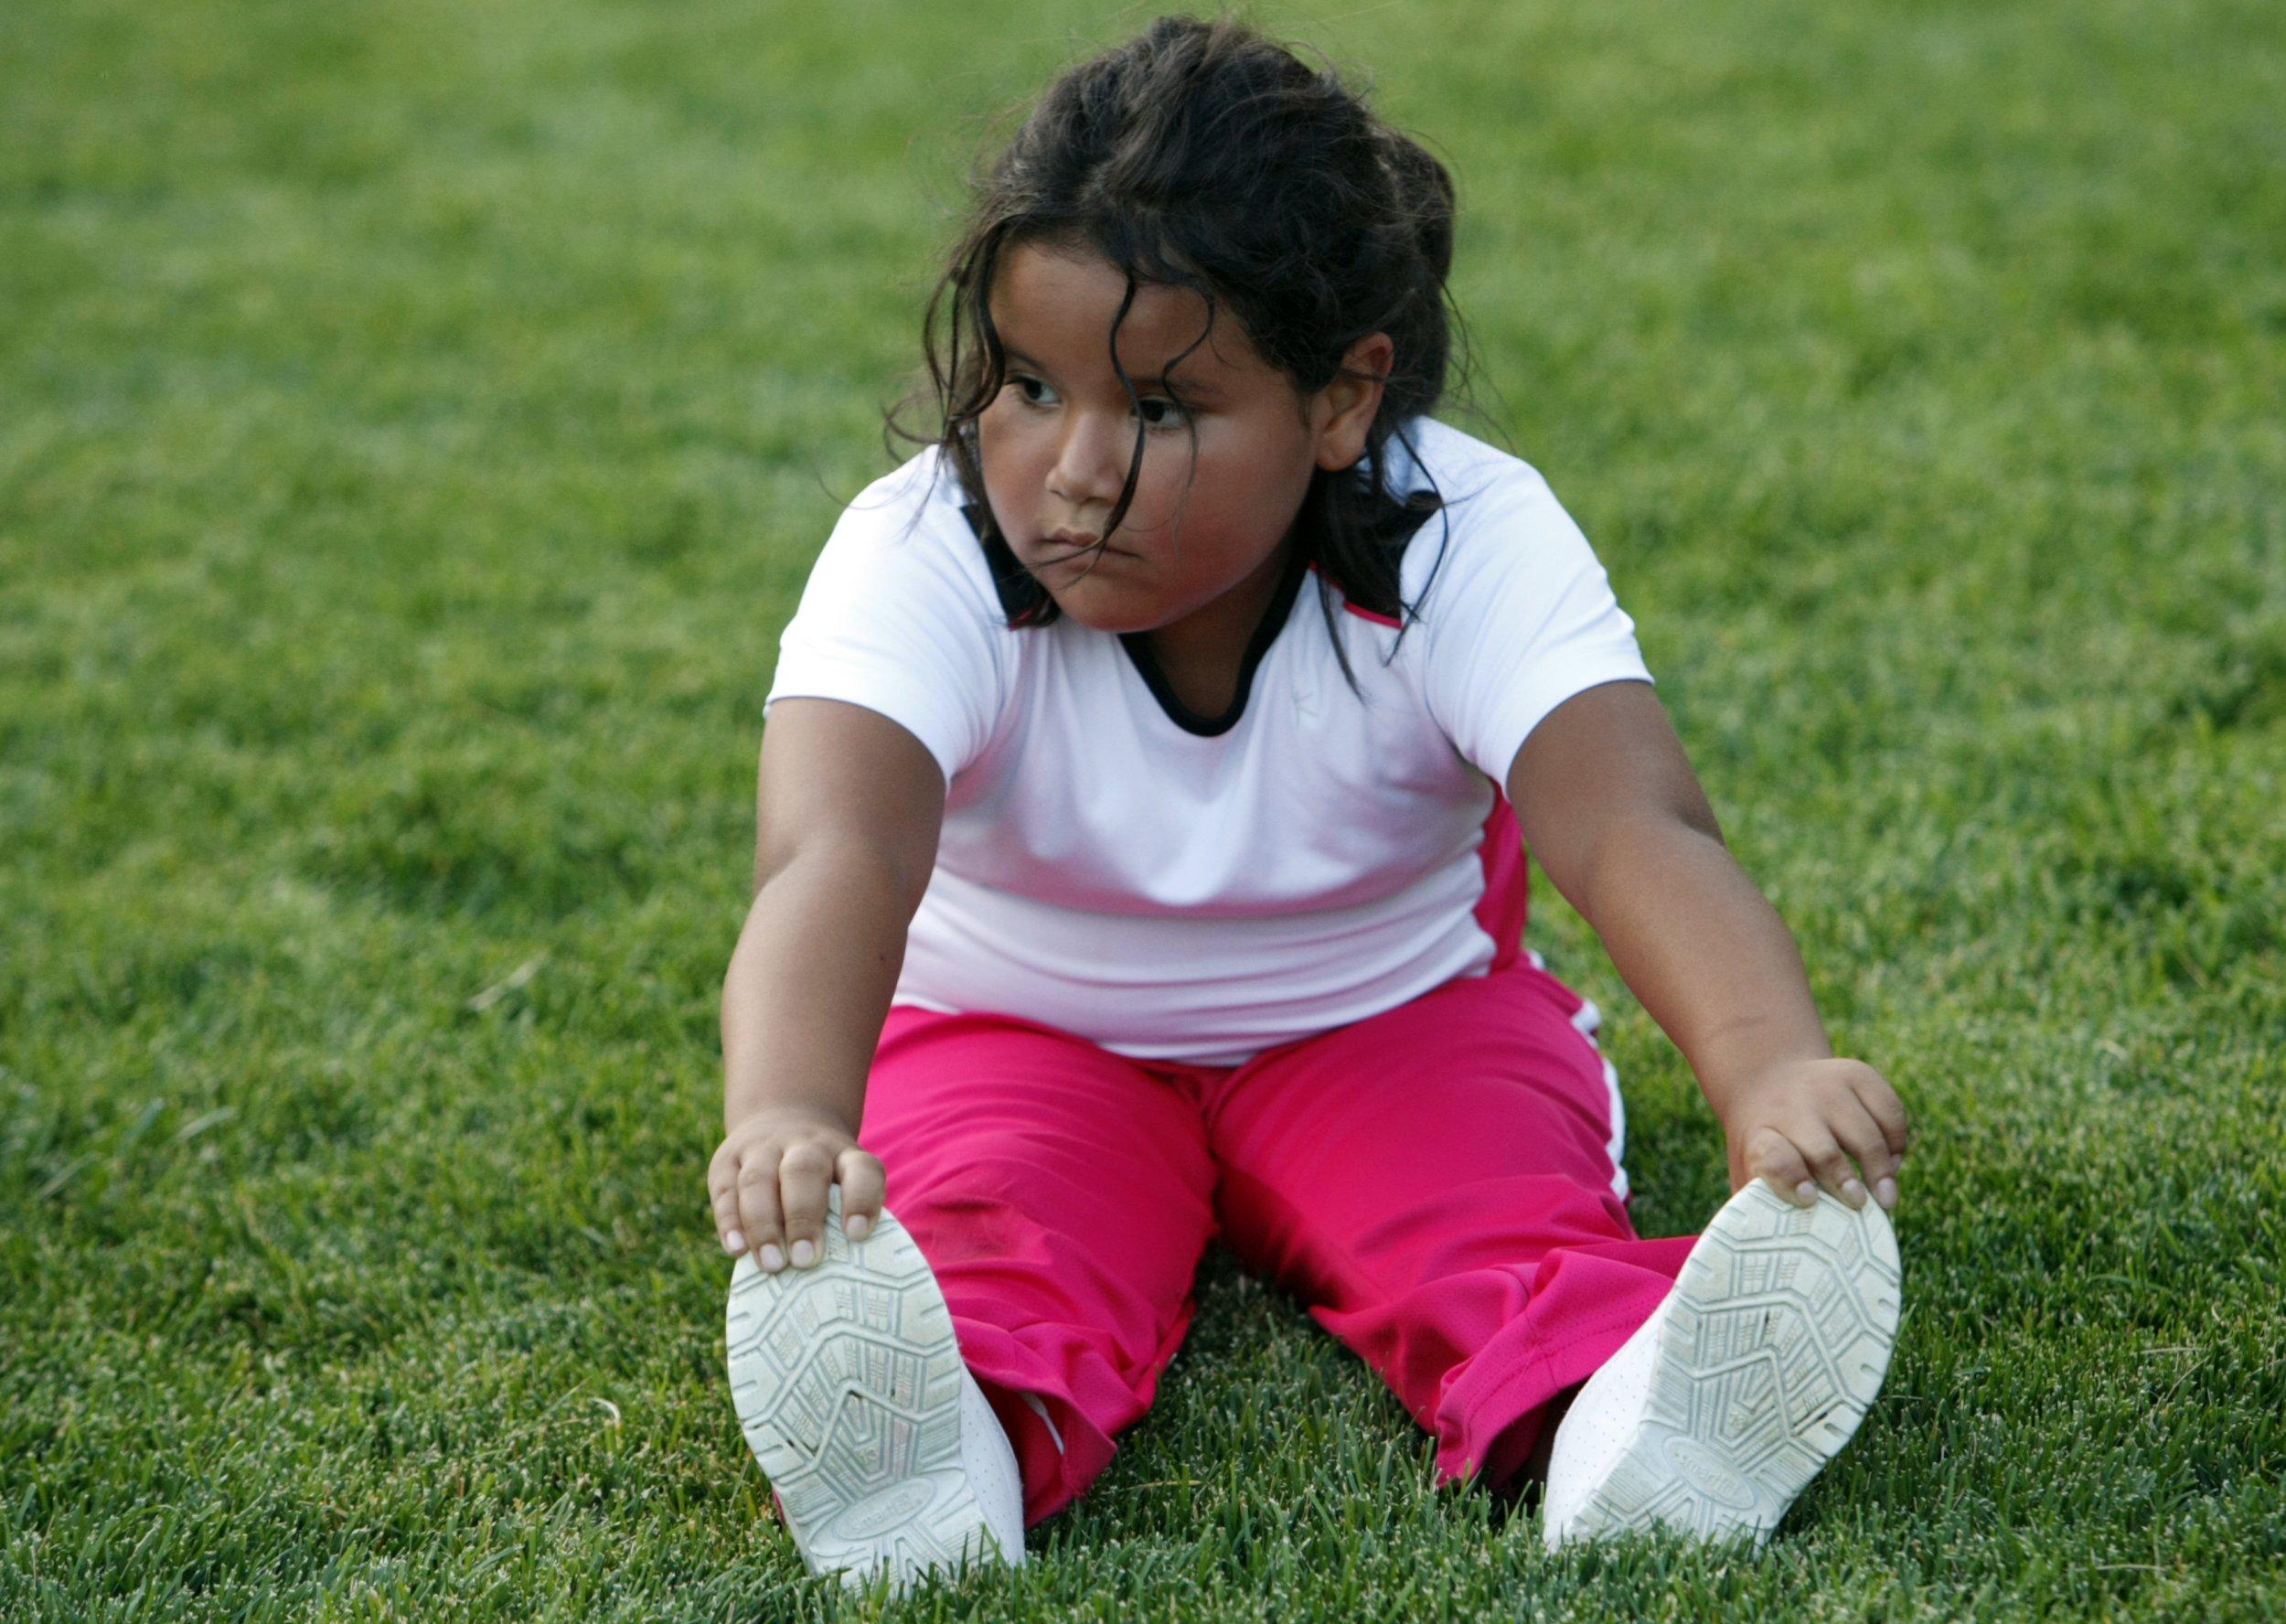 Overweight Black Kids It's Far Too ...